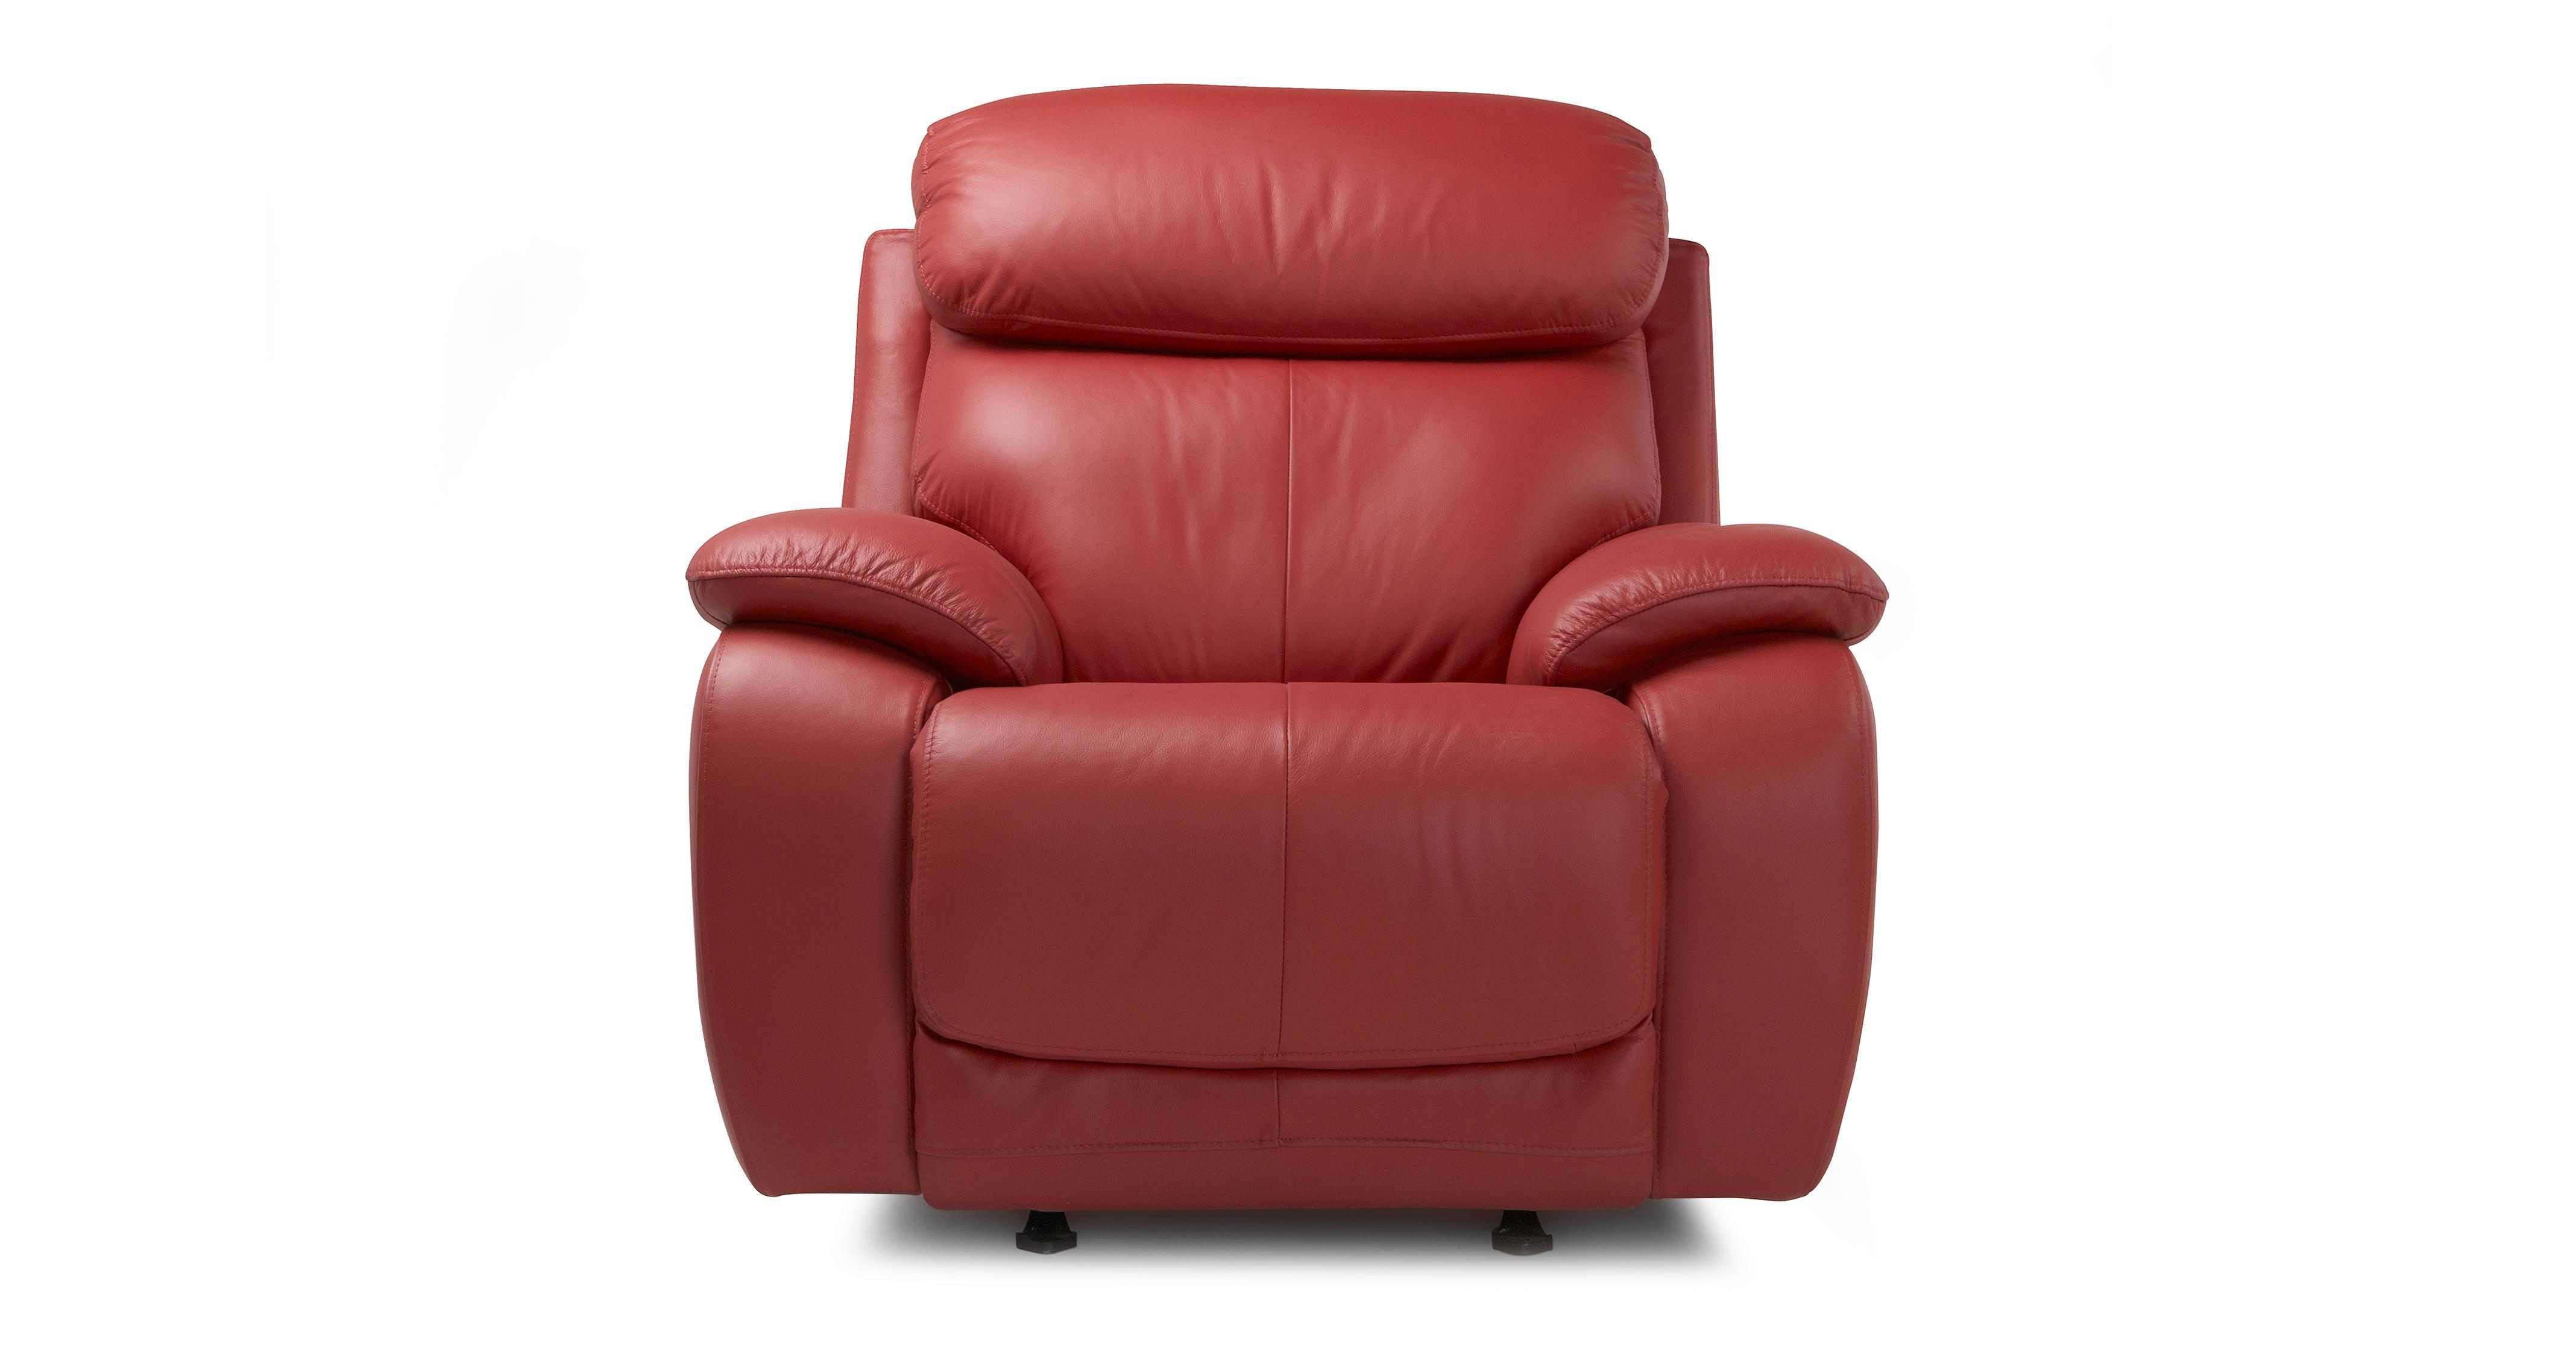 Daytona Rocker Recliner Chair Peru